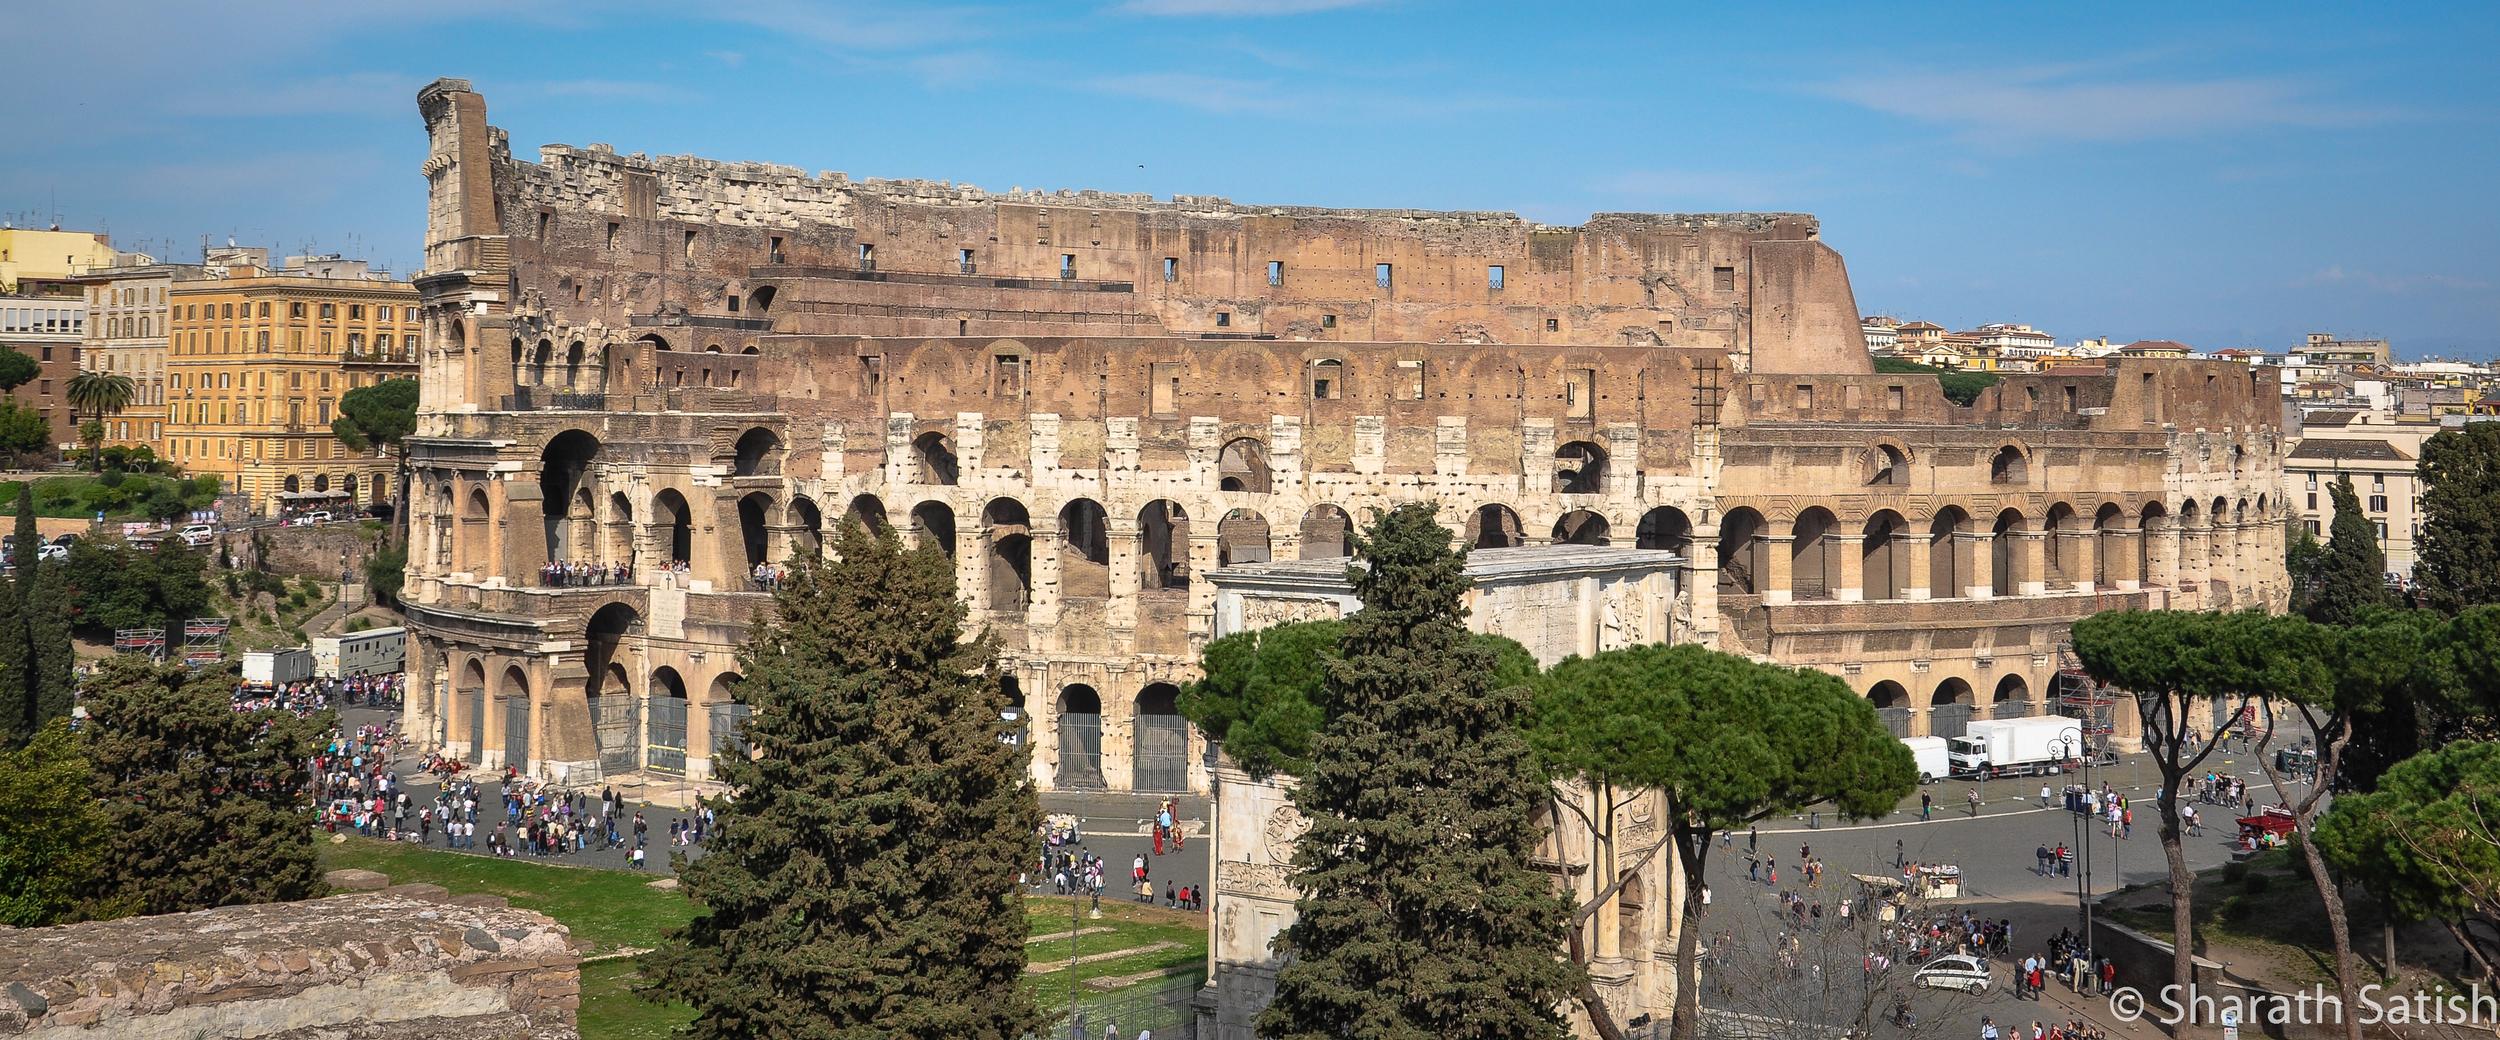 Colosseo, also called Amphitheatrum Flavium